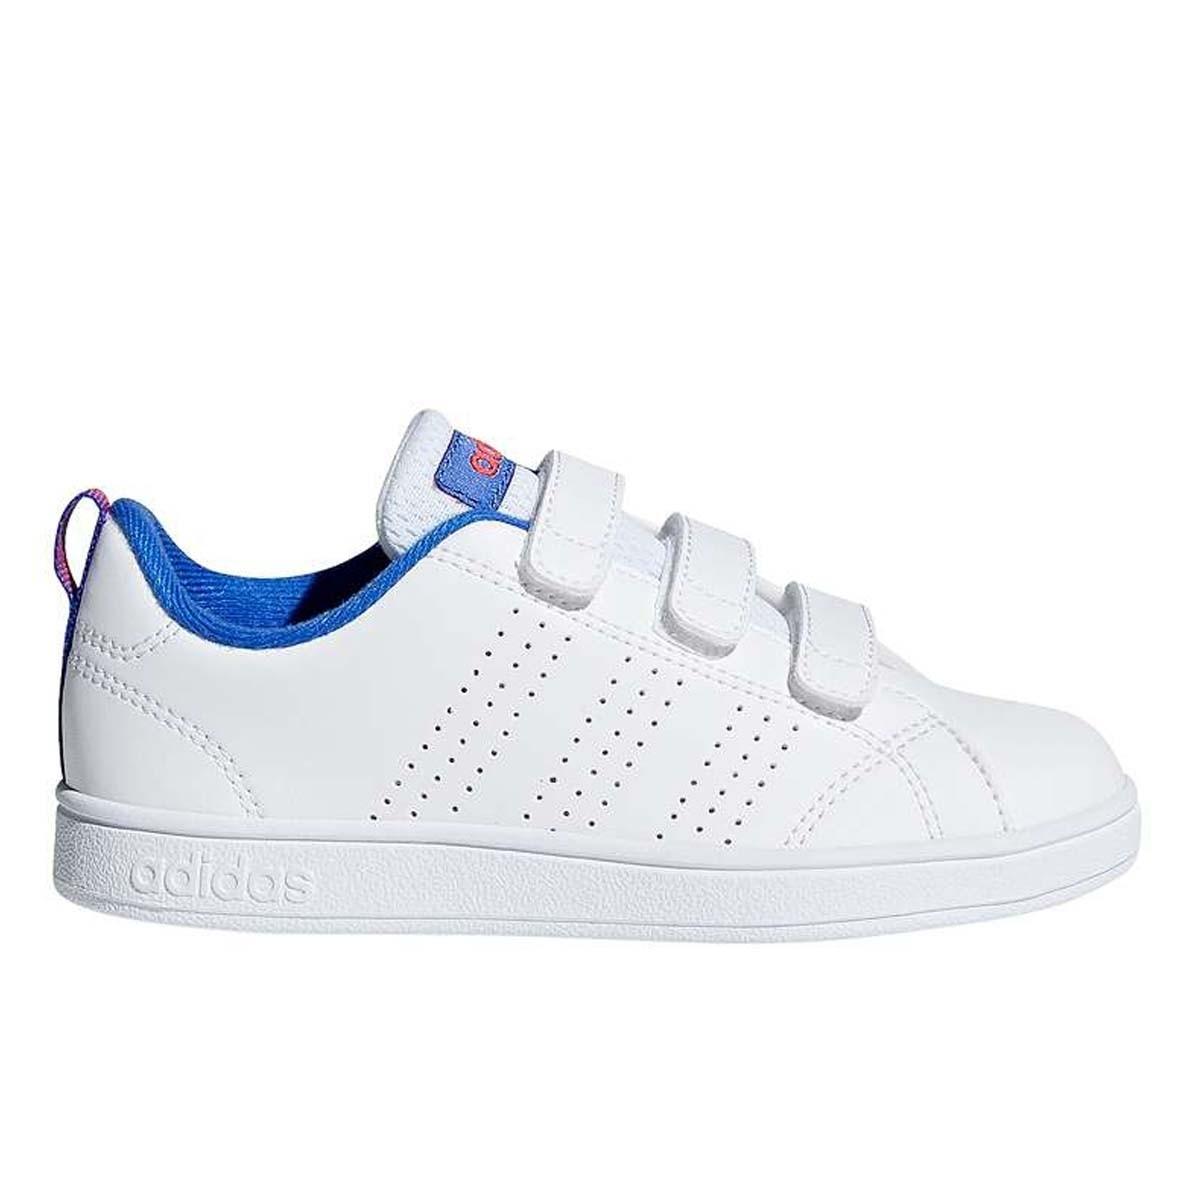 Adidas VS ADVANTAGE CLEAN CMF C SNEAKER ΠΑΙΔΙΚΟ